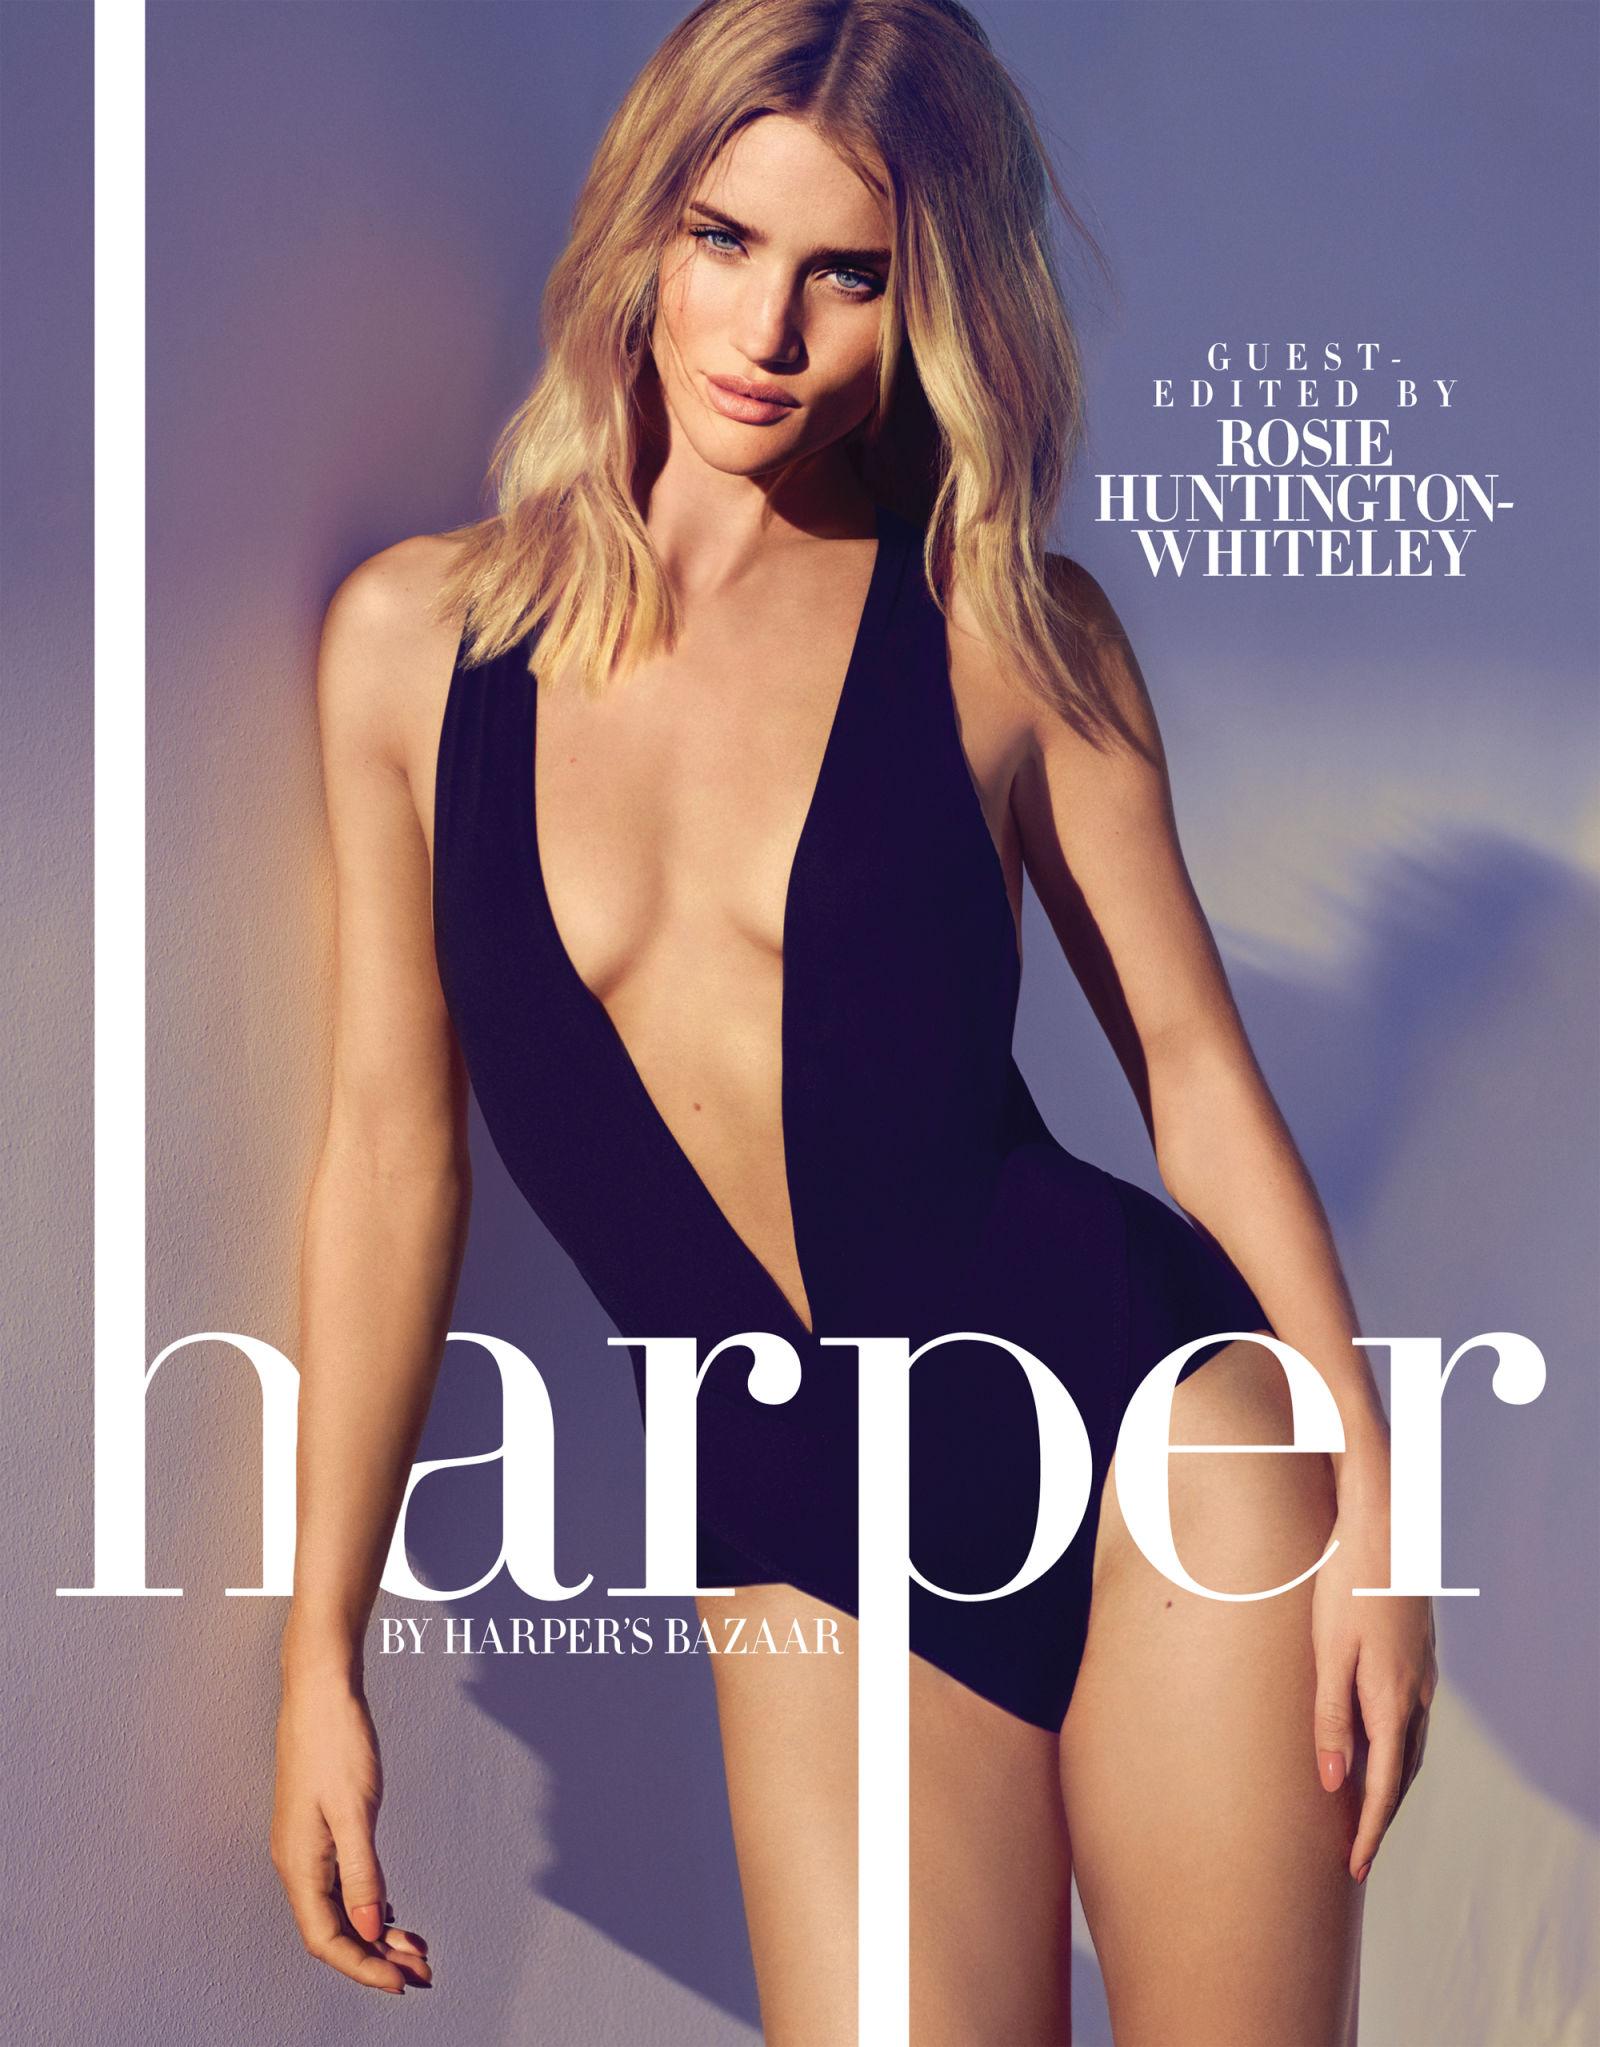 hbz-rosie-harper-cover.jpg